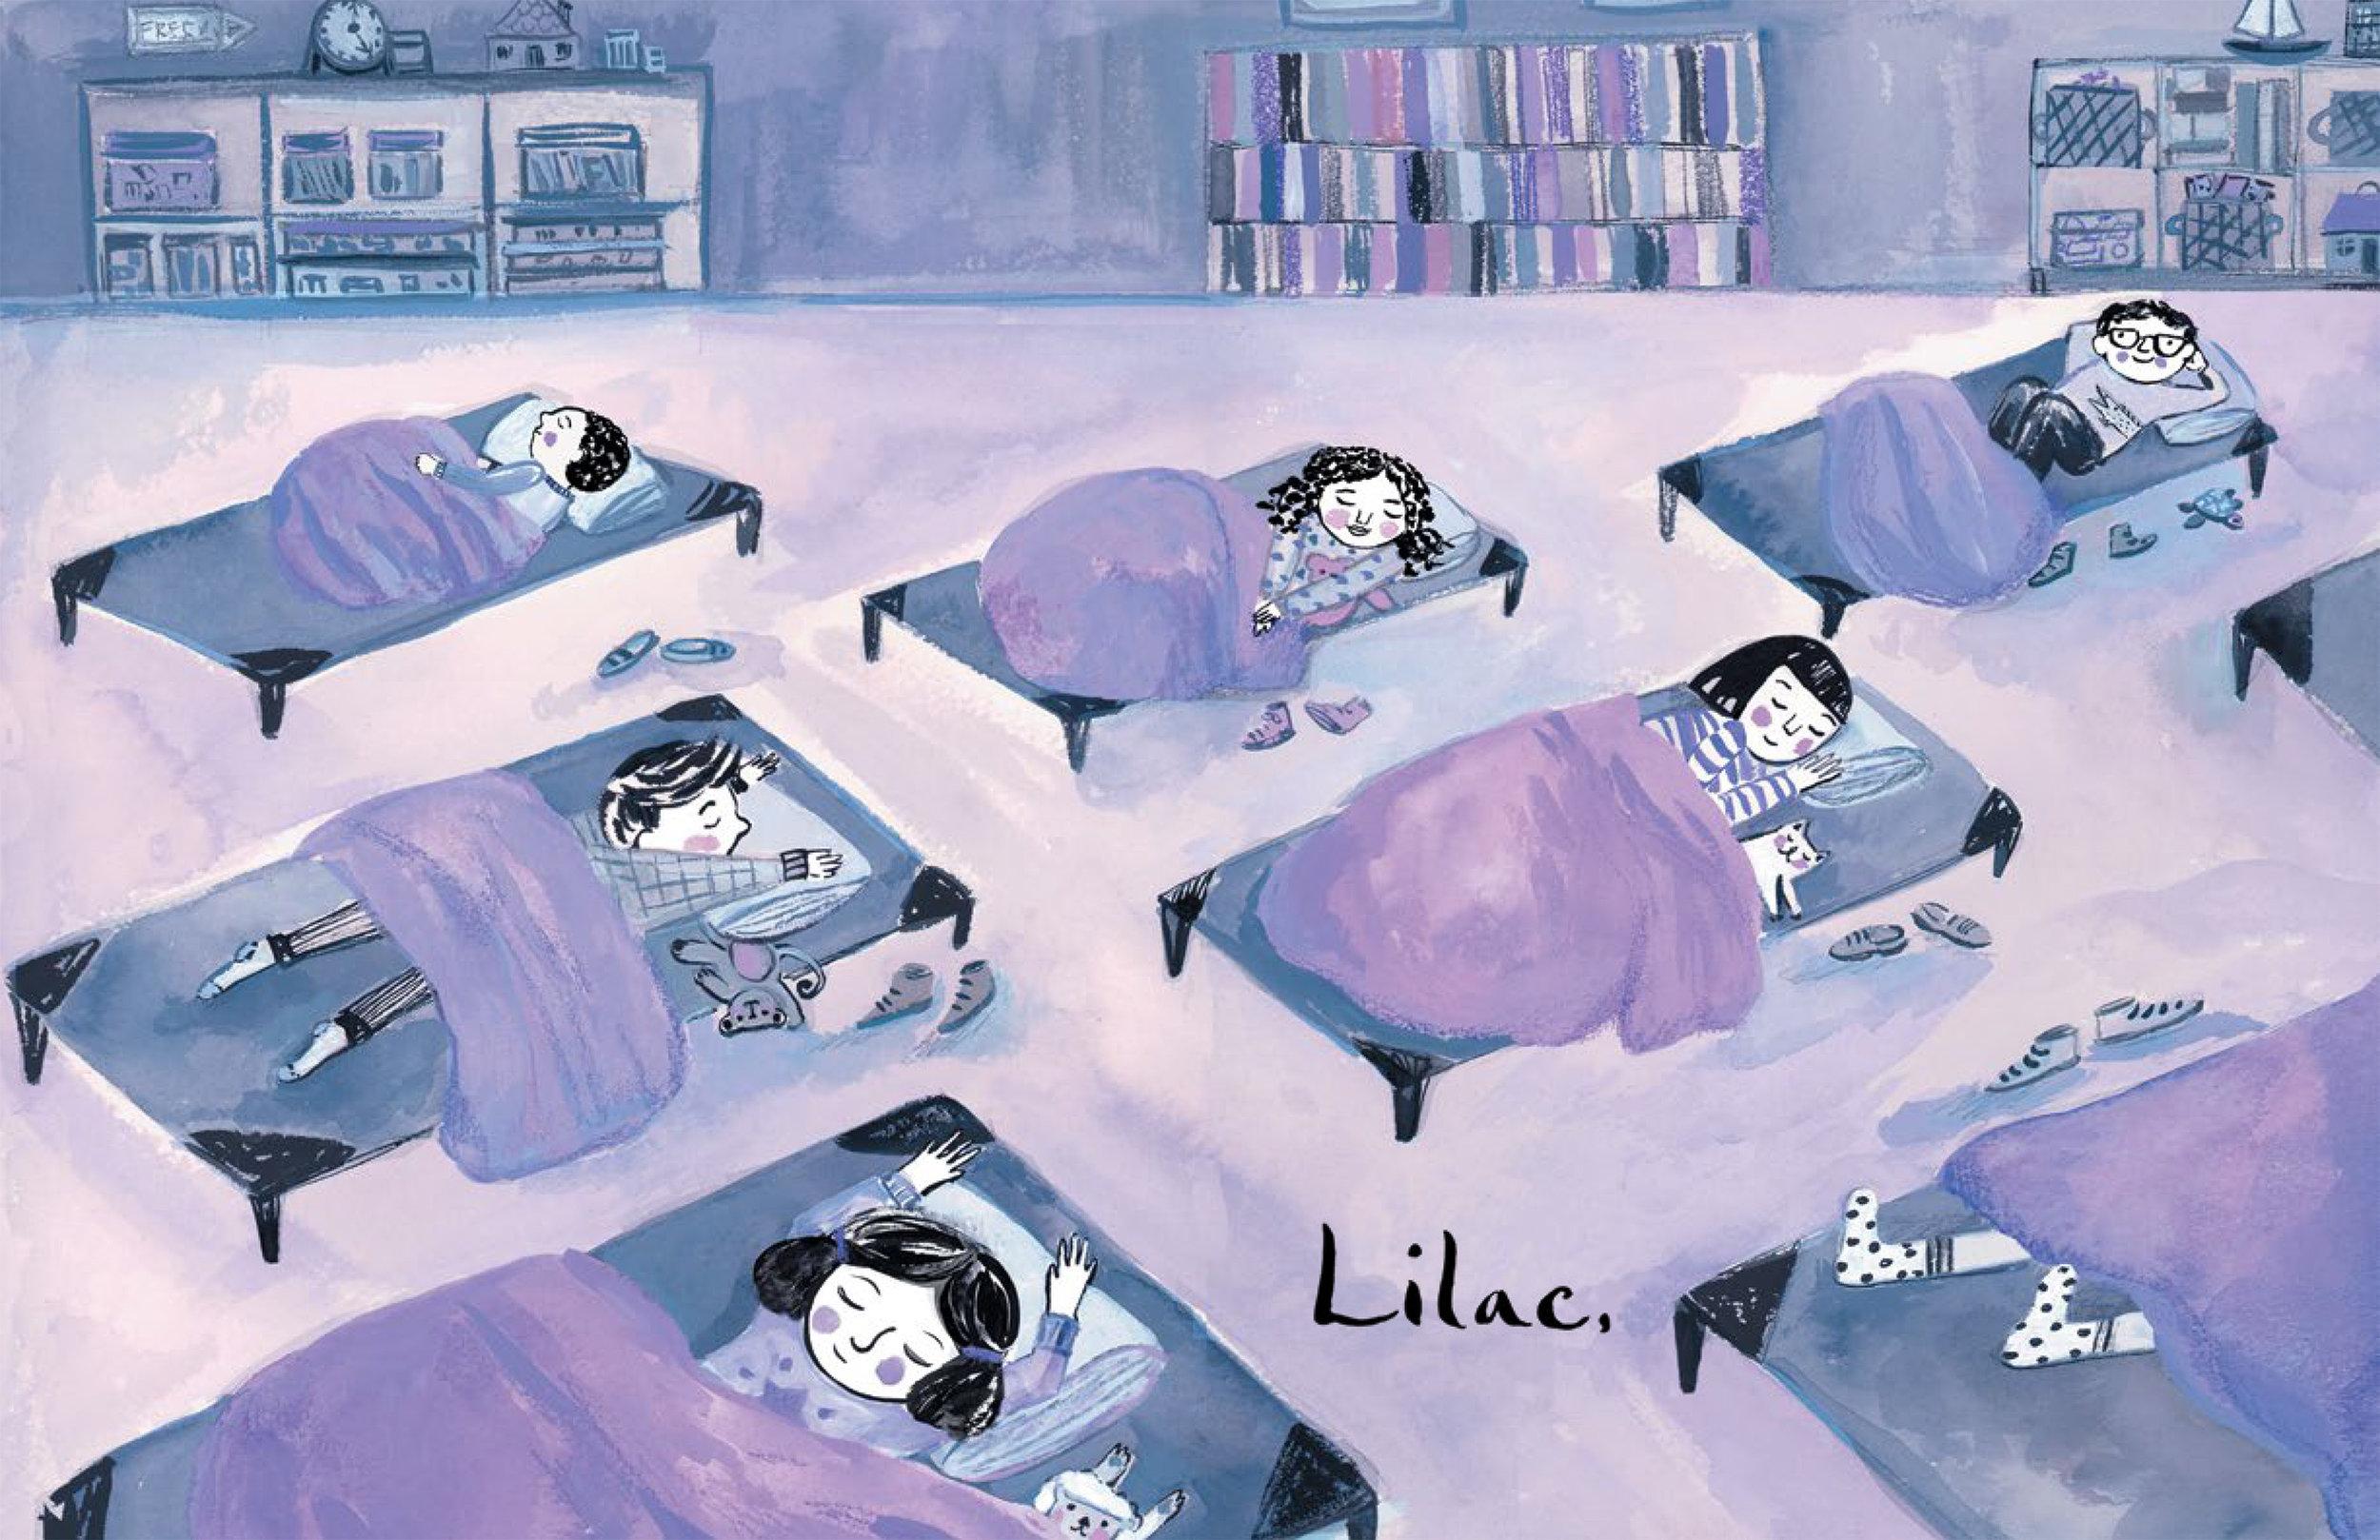 Lilac_IFeelTeal_FNLint[2][4]-11.jpg